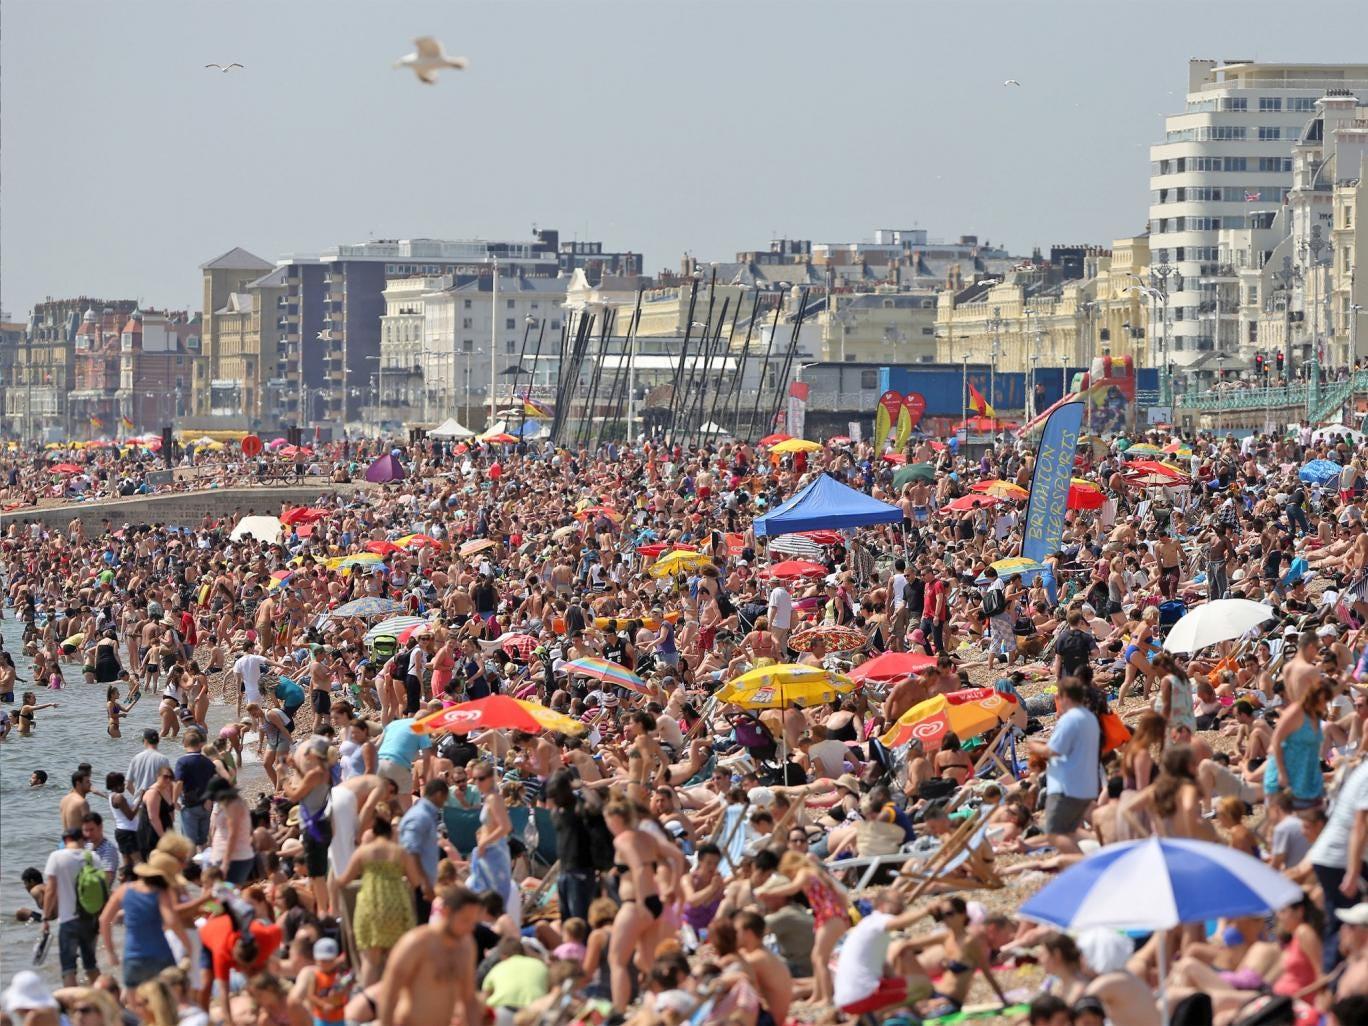 A packed Brighton beach last weekend